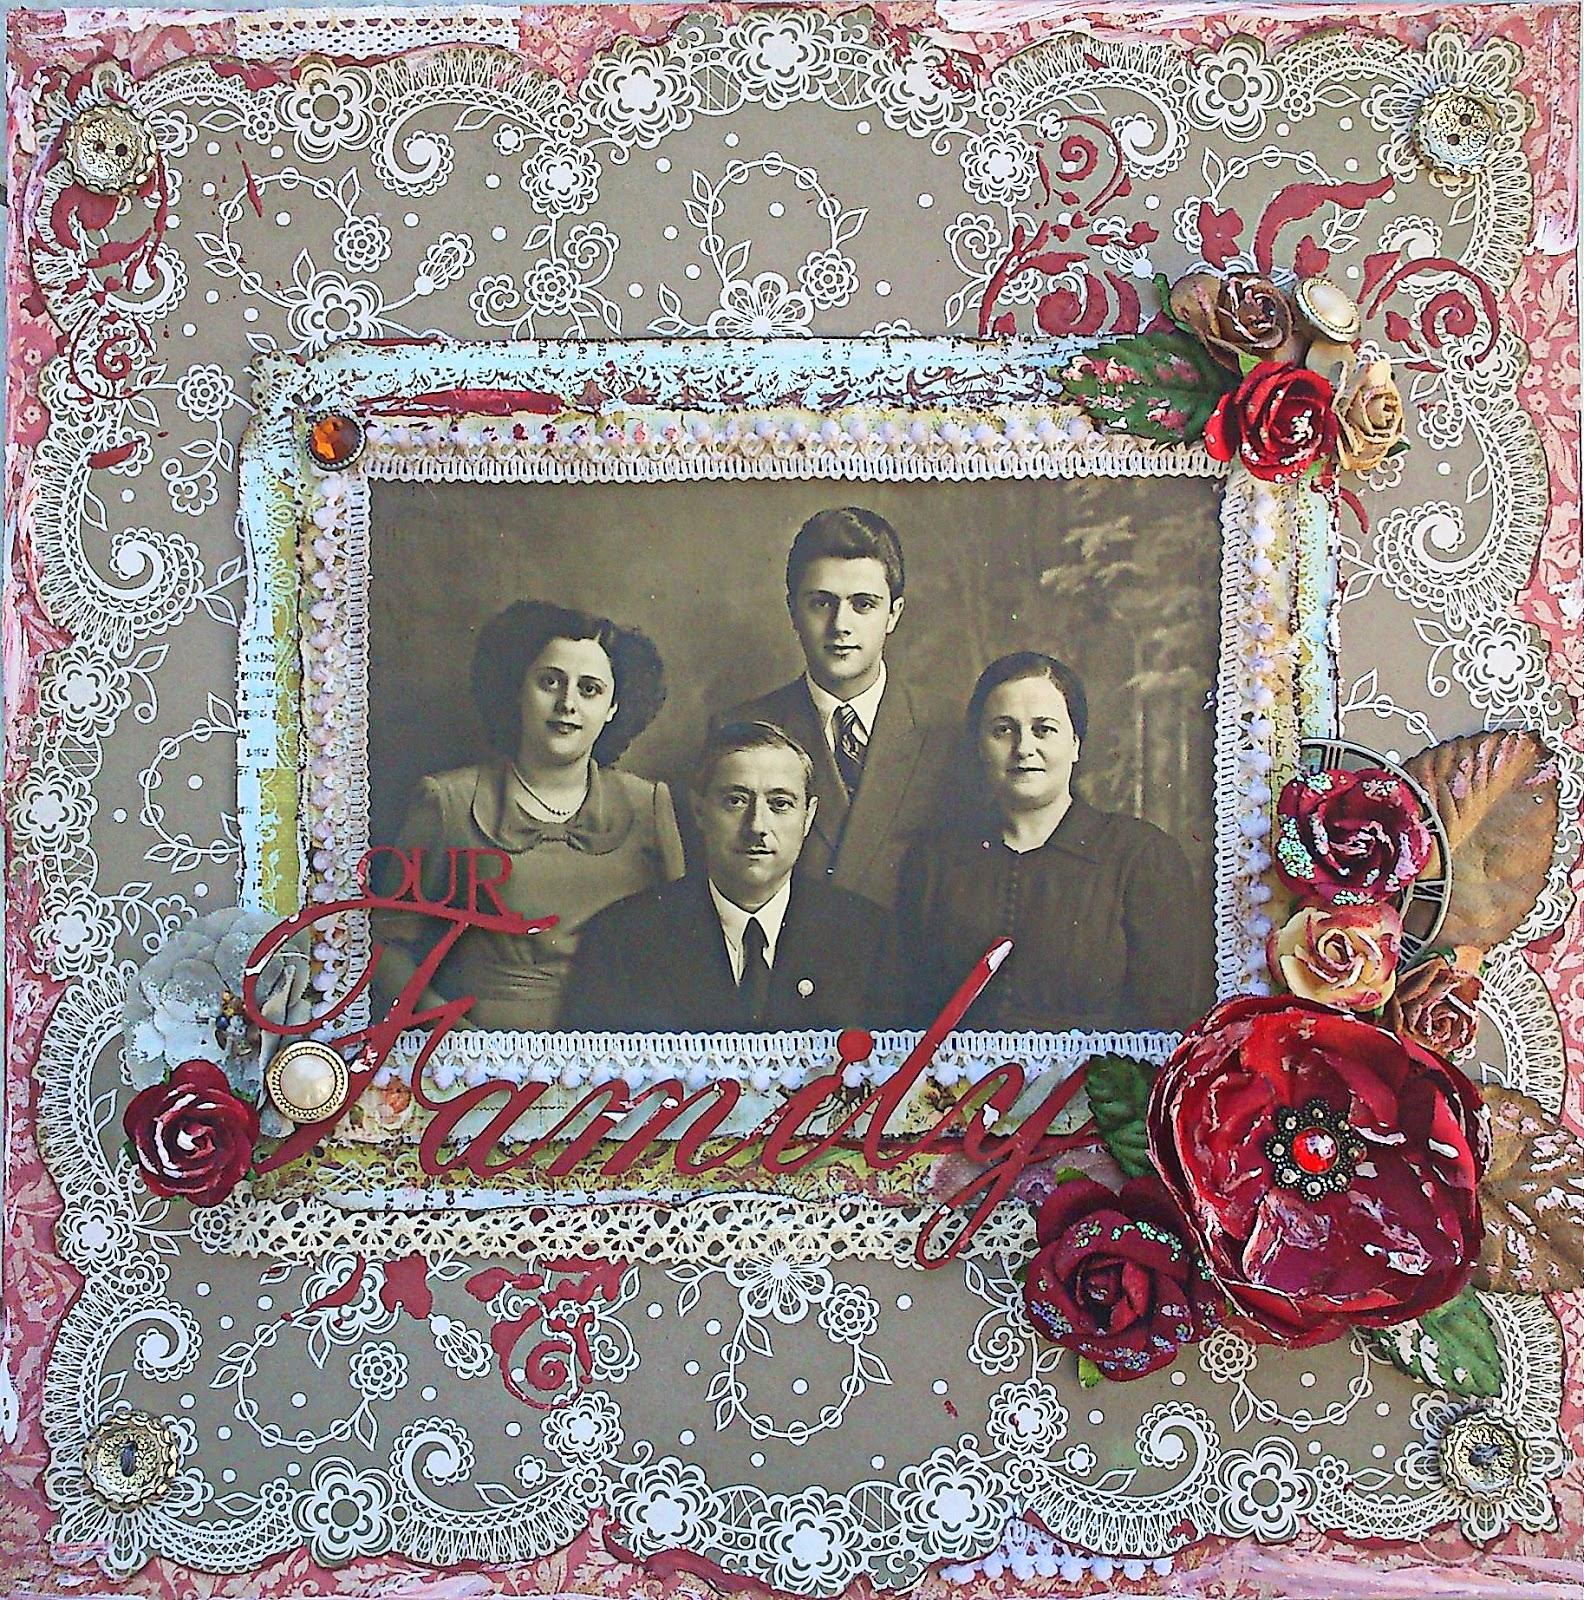 http://1.bp.blogspot.com/-NZqVgjRBGyg/UkLVQ2UXTkI/AAAAAAAACSo/gcMVWj_X9PE/s1600/our+family.jpg